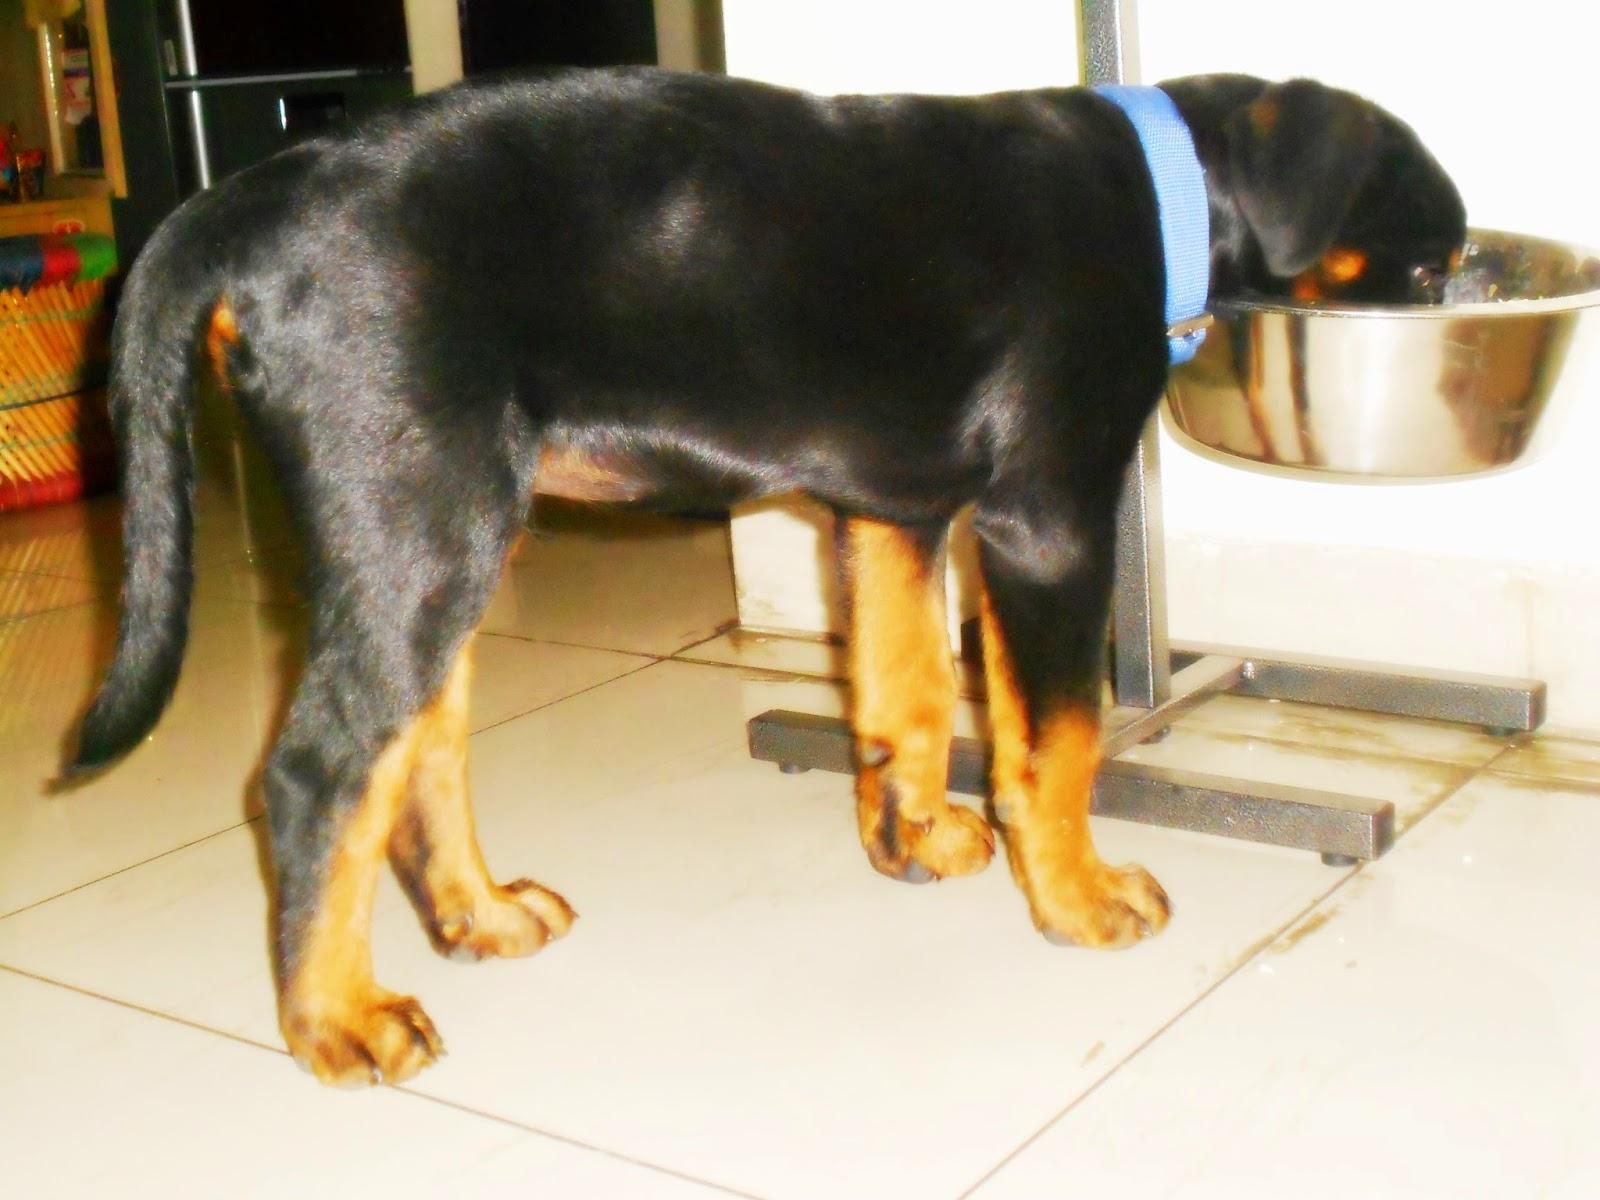 Leo The Rottweiler 3 Months Old Rottweiler Puppy Day 92